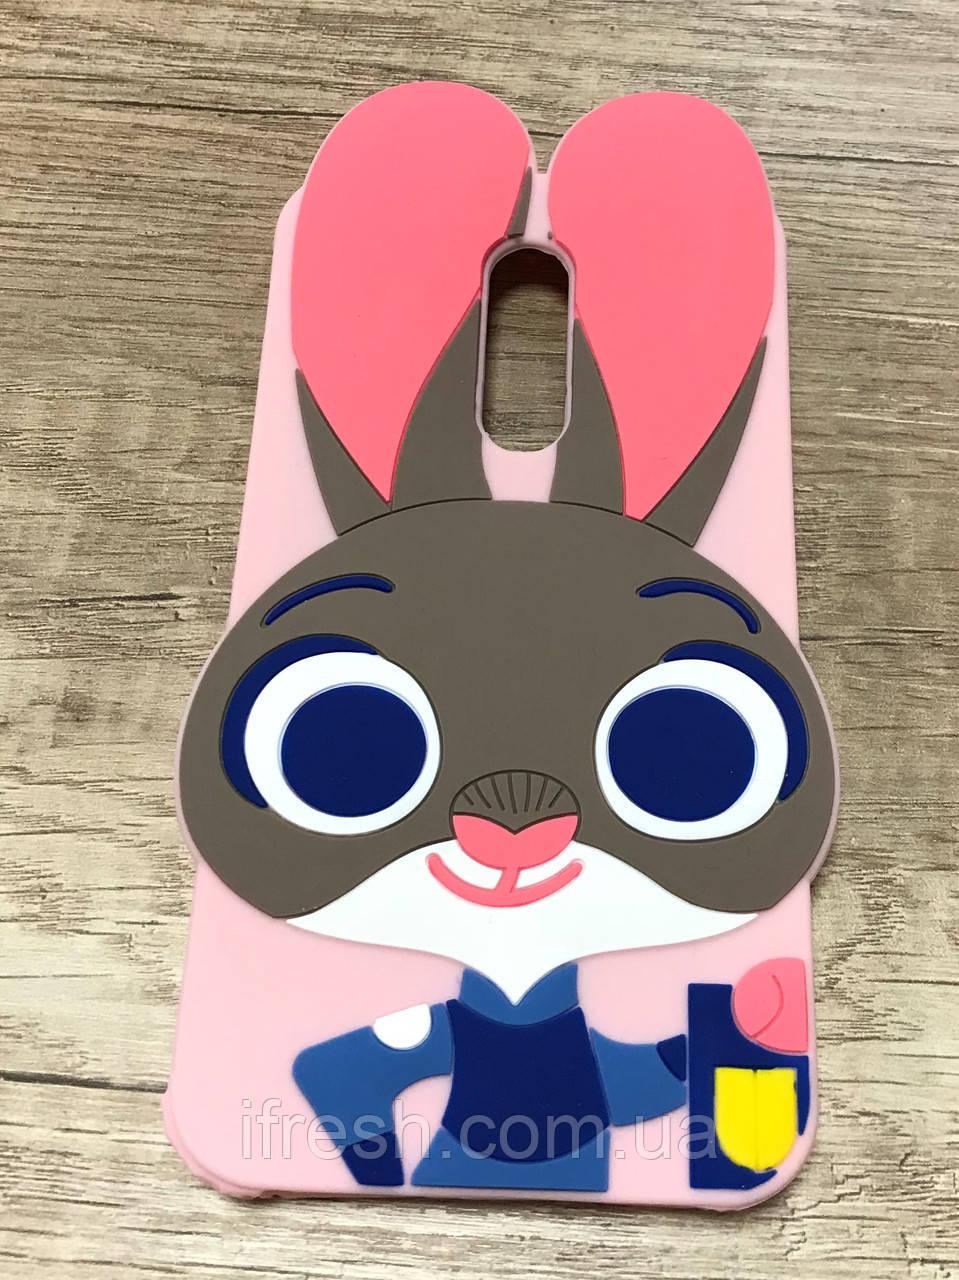 Чехол Джуди Хопс для XIAOMIRedmi Note 4, Зверополис pink